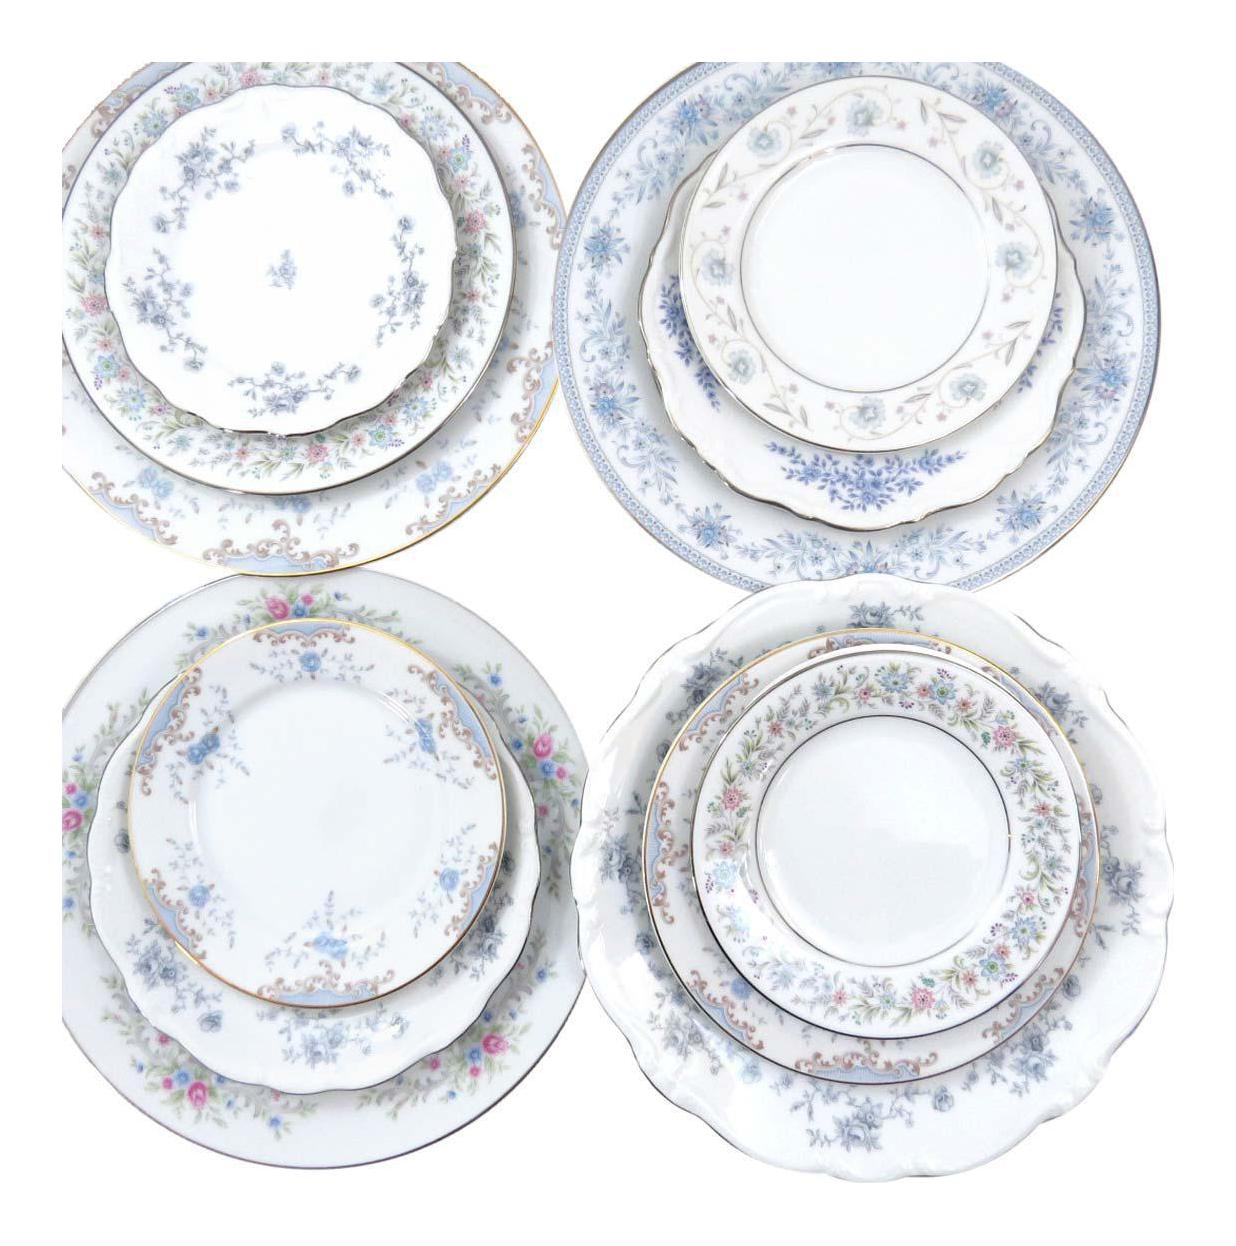 Vintage Mismatched Fine China Dinnerware Set - Service for 4  sc 1 st  Chairish & Vintage Mismatched Fine China Dinnerware Set - Service for 4 | Chairish